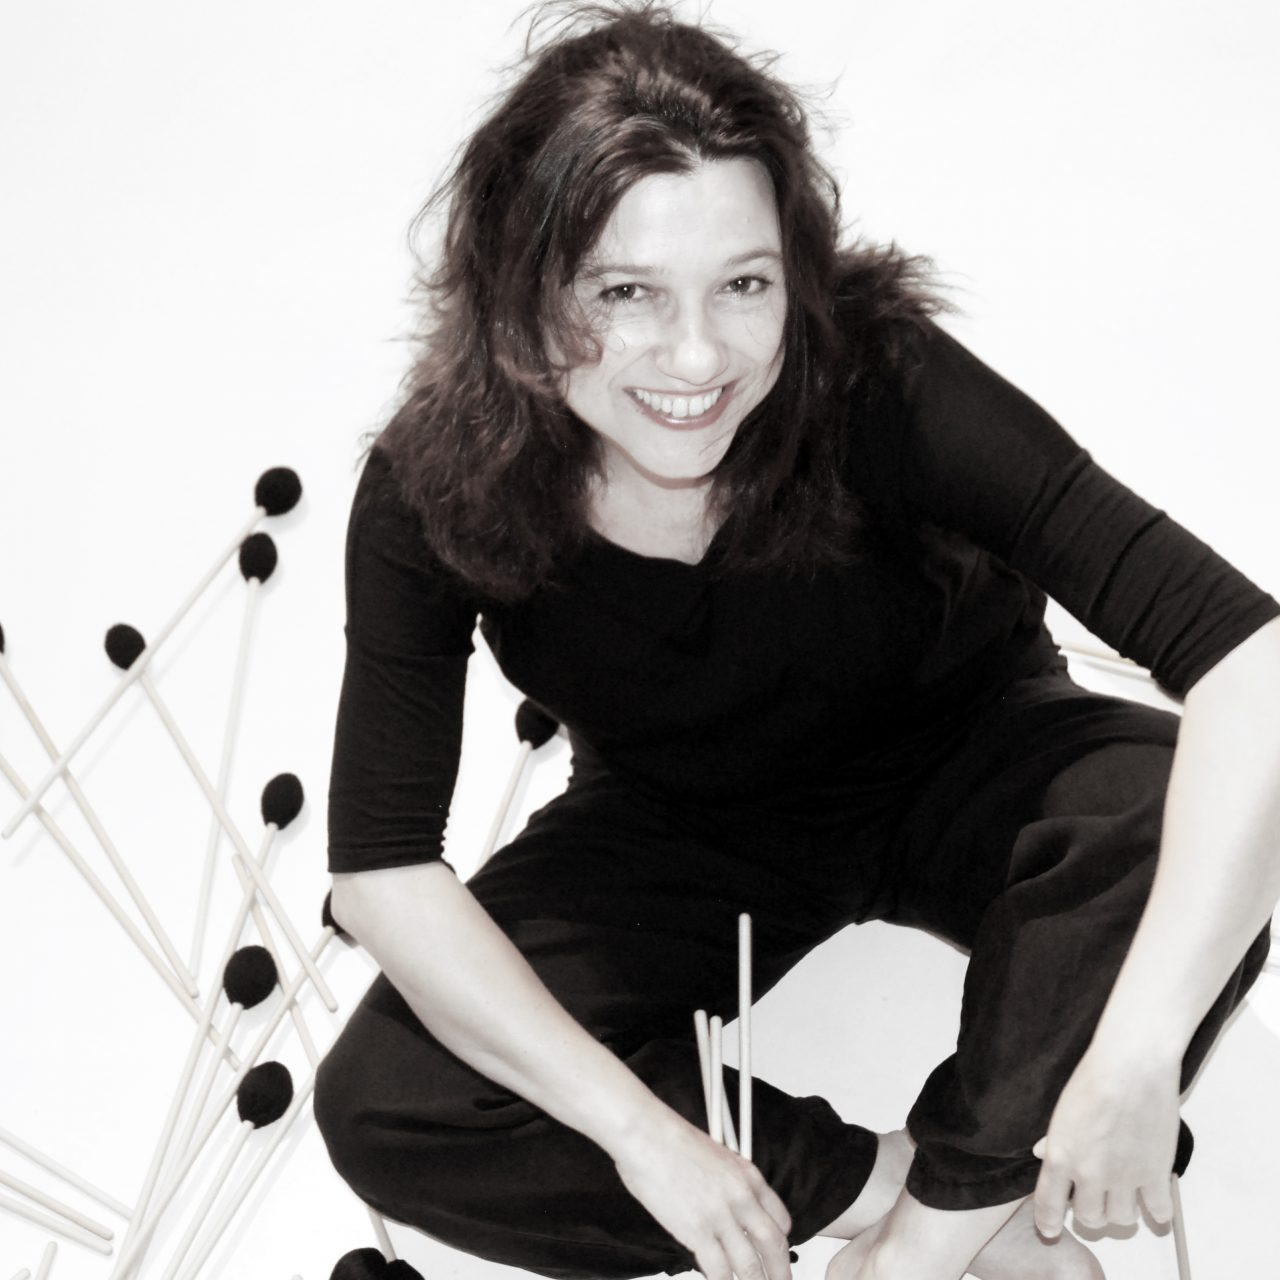 Tatiana Koleva